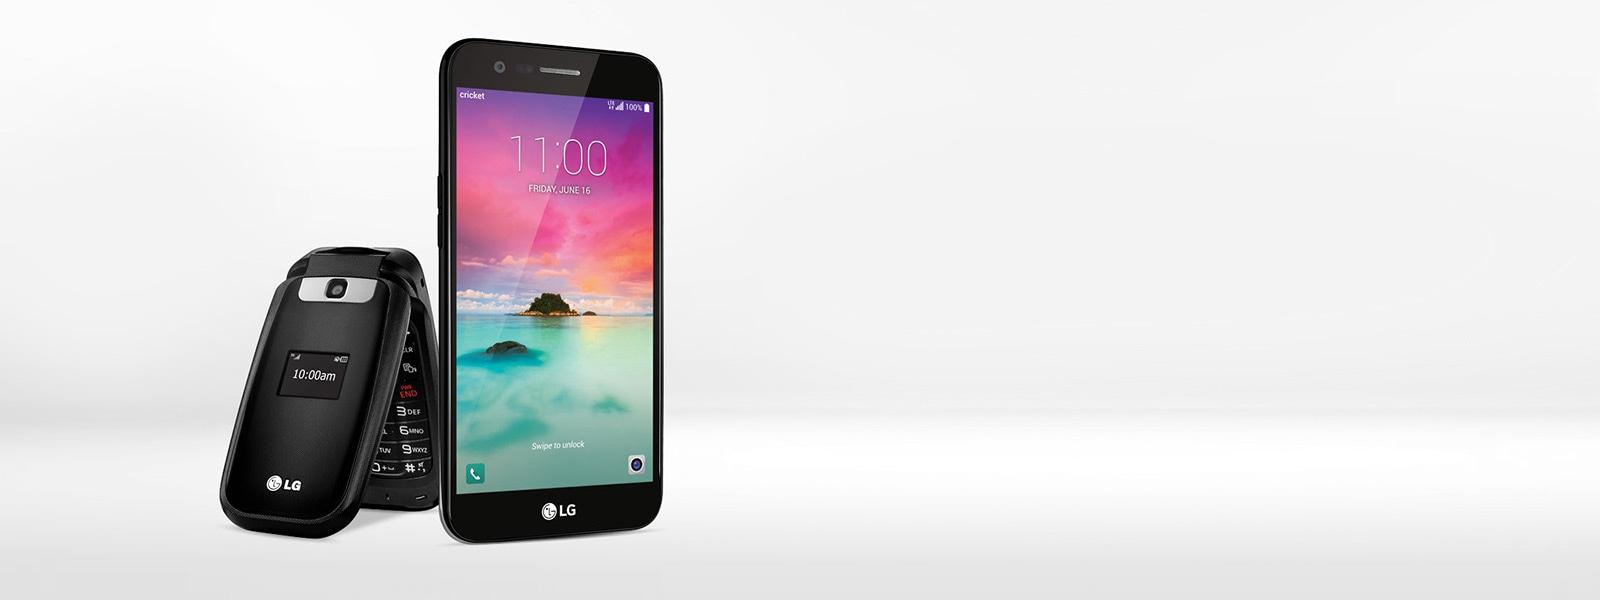 Lg Cricket Basic Phones Flip Phones Senior Phones More